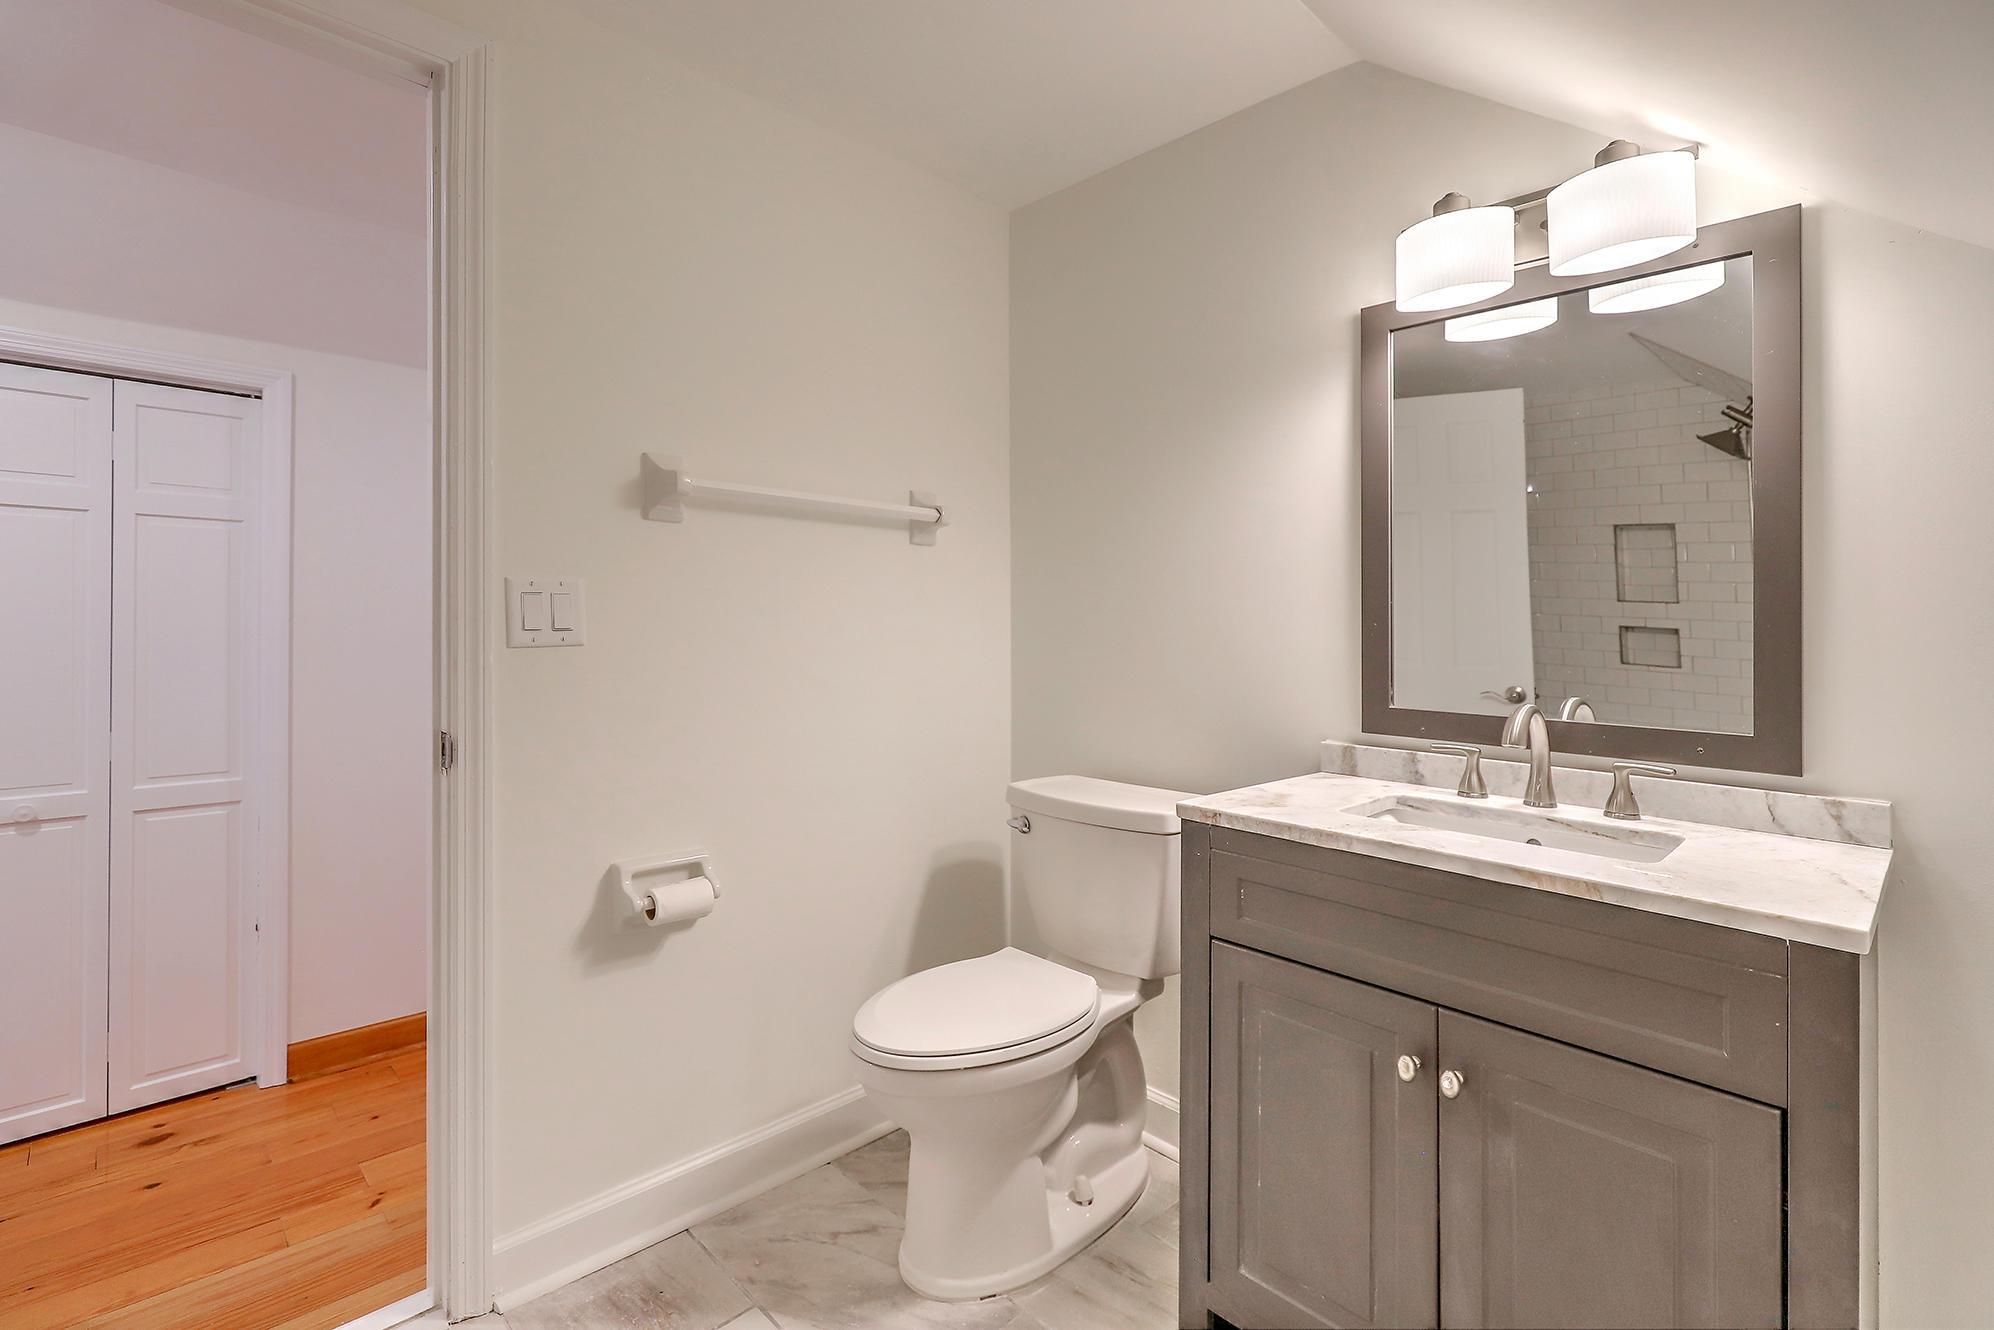 Edgewater Park Homes For Sale - 1413 Edsent, Charleston, SC - 21